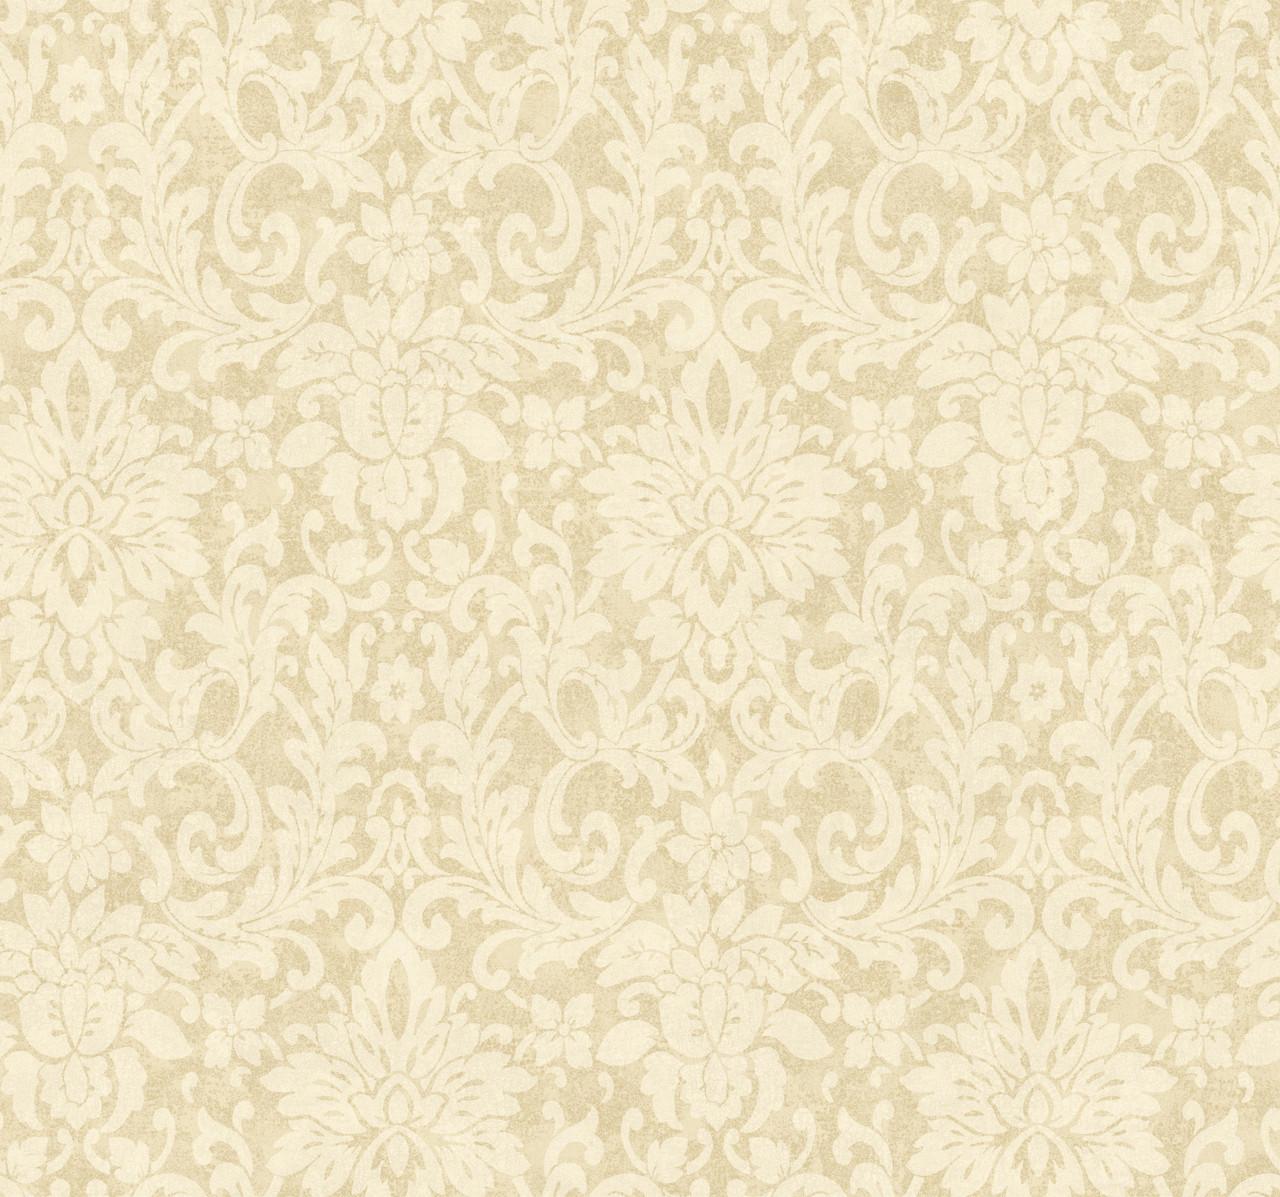 Handpainted Iii Hp0342 Floral Damask Wallpaper Indoorwallpaper Com